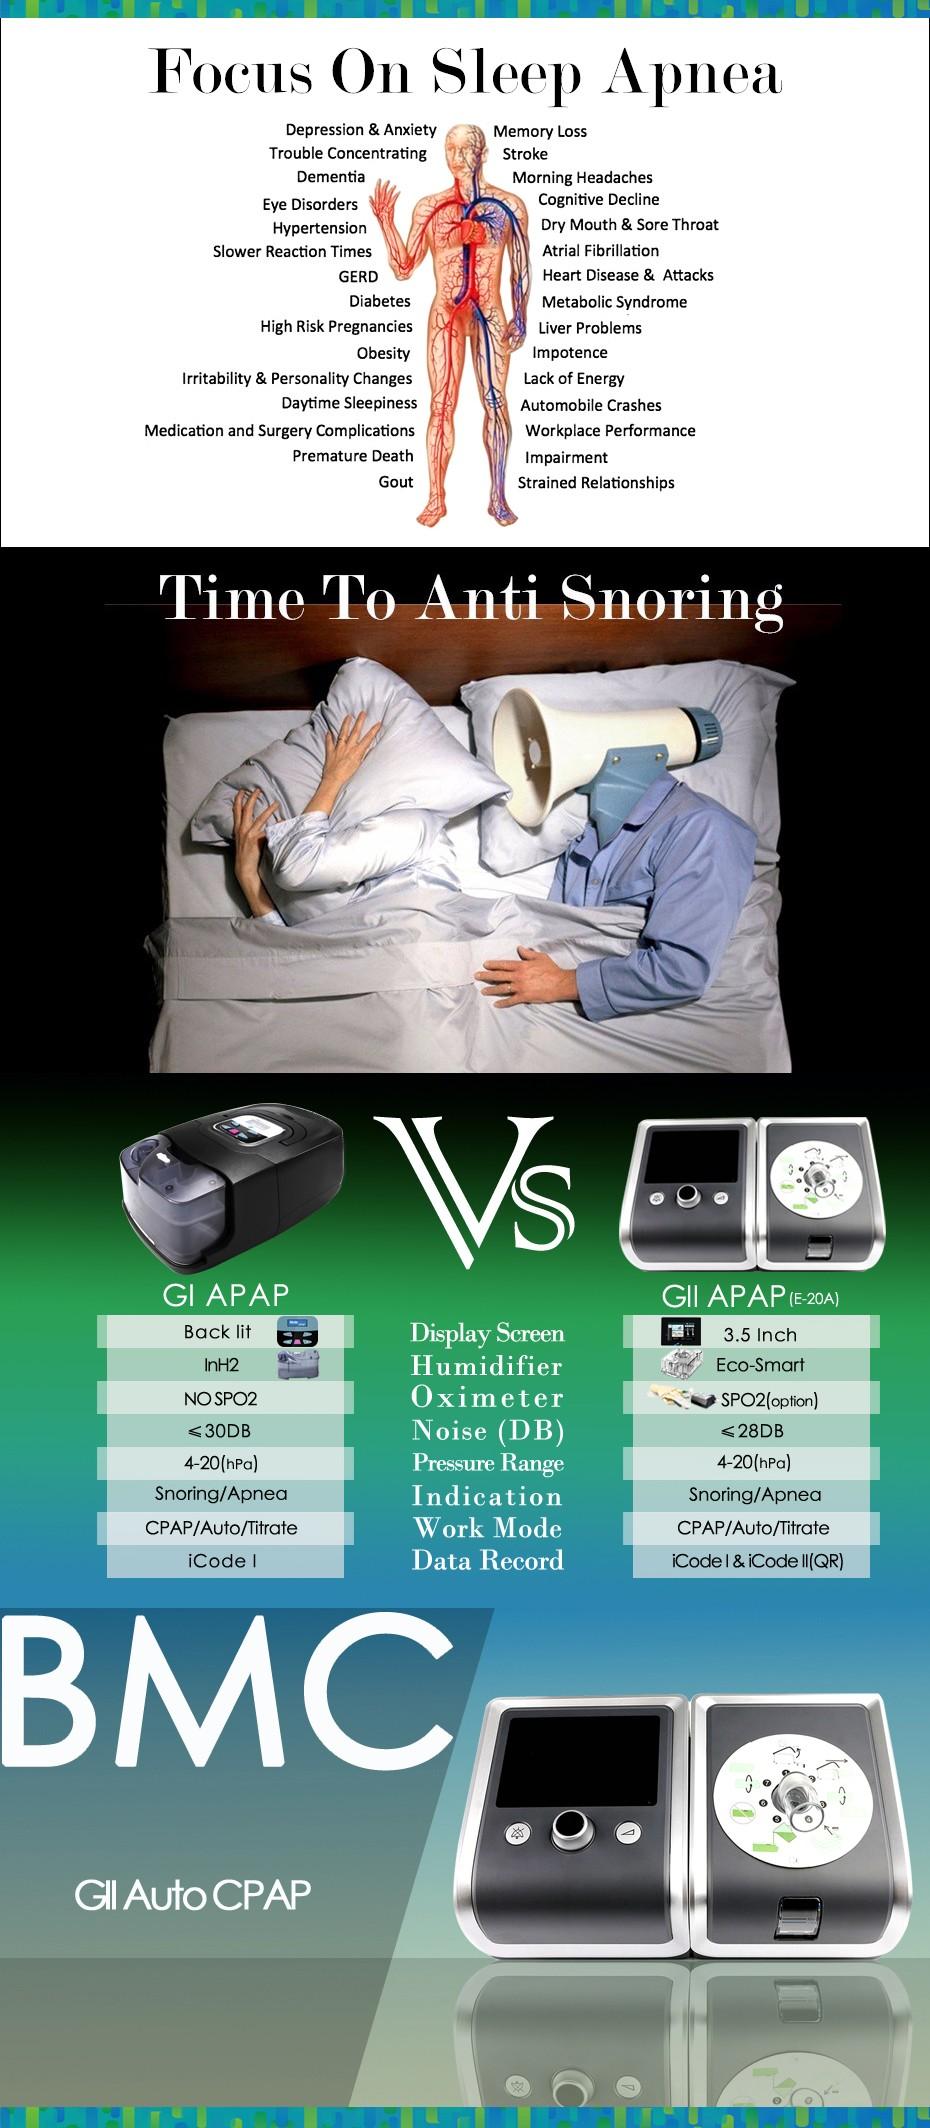 GII Auto CPAP Machine E-20AH-O Smart Home Ventilator For Sleep Snoring Apnea With Humidifier Mask Hose SD Card Free Shipping (28)